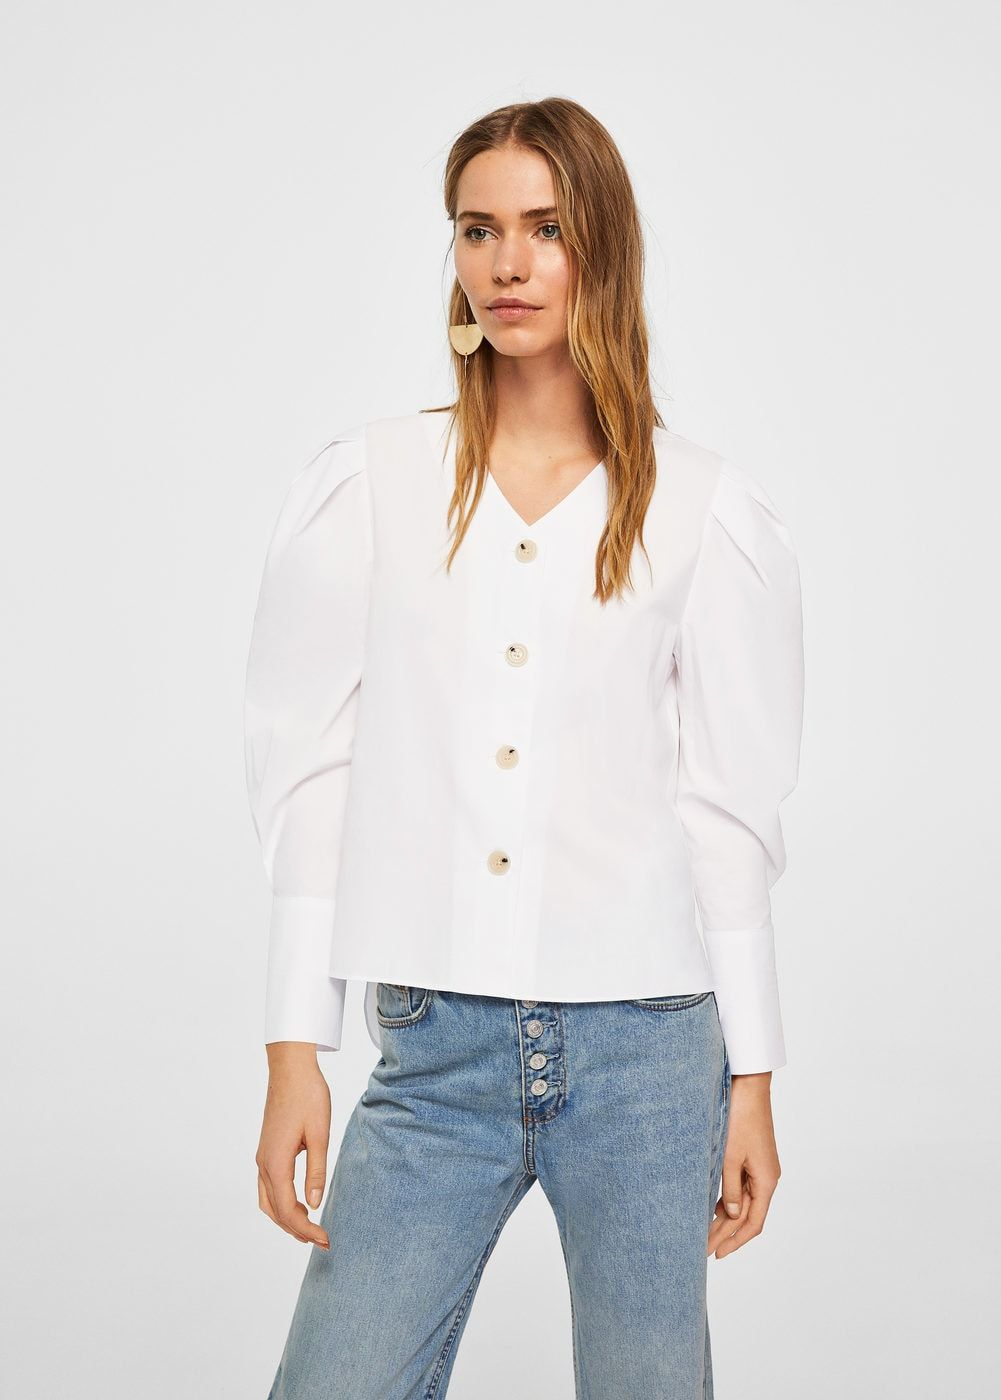 Camisa popelín manga abullonada - Camisas de Mujer  fb0f78f2a930